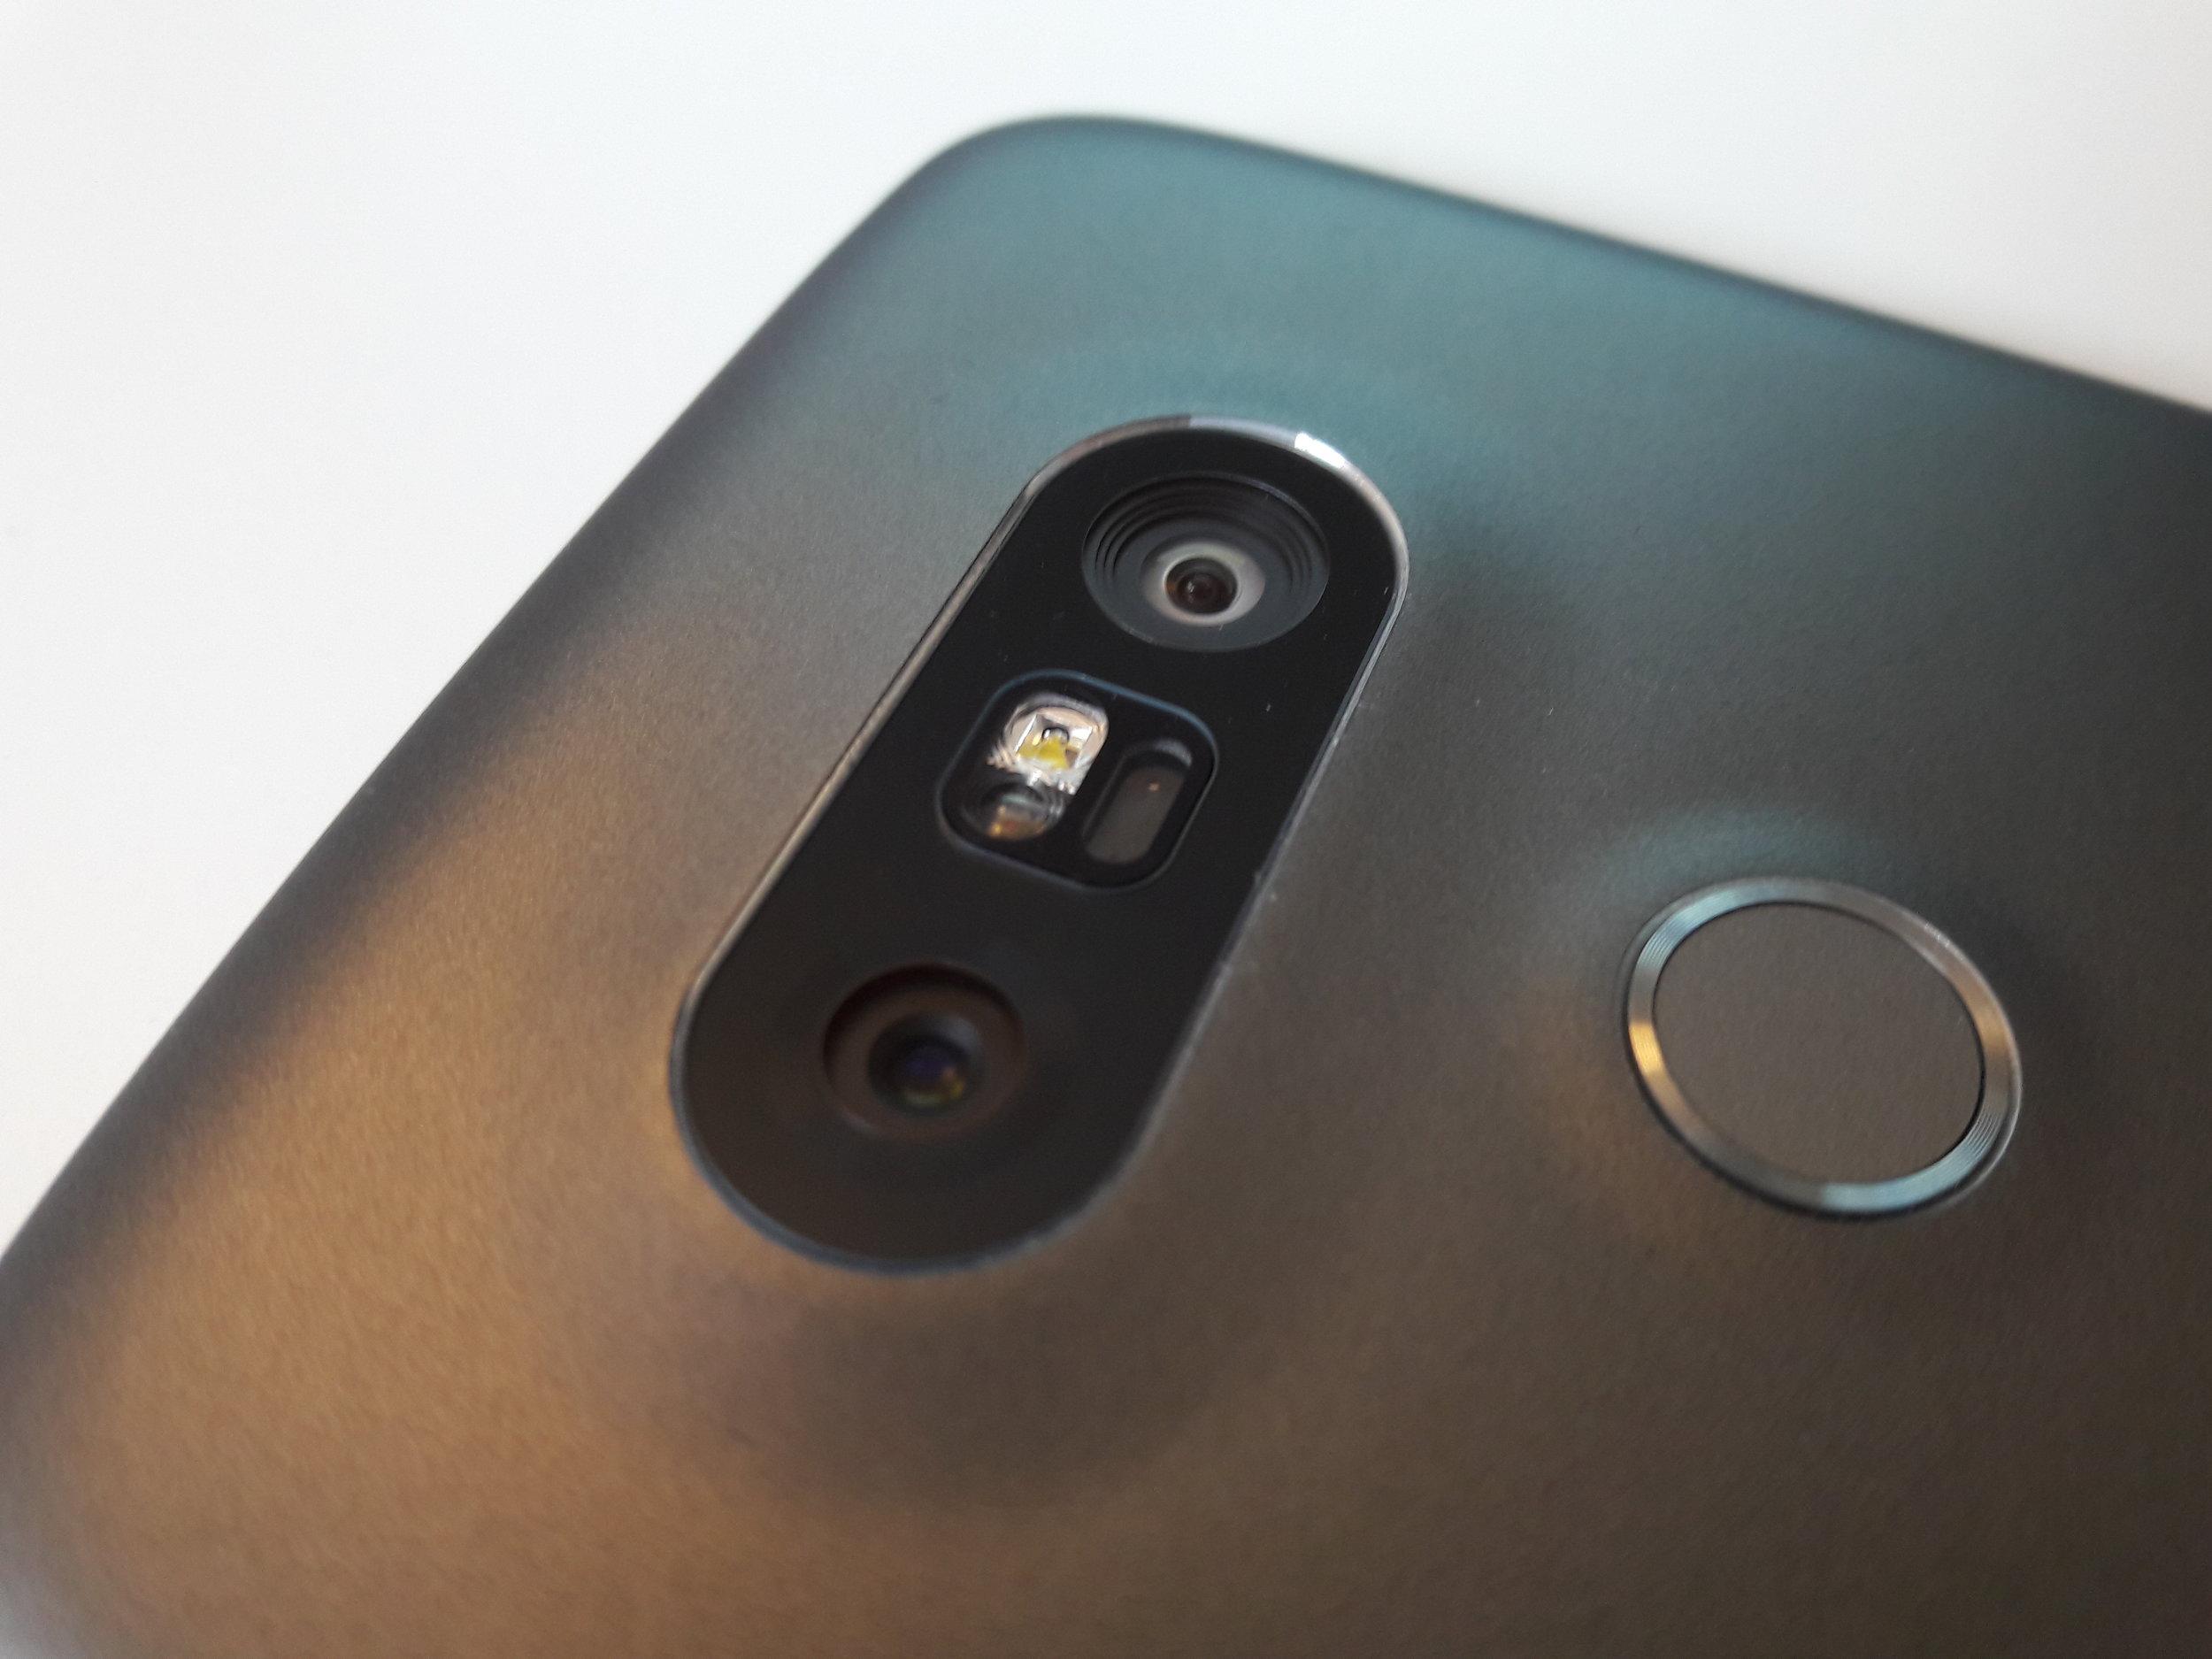 Kamera des Handy LG G5